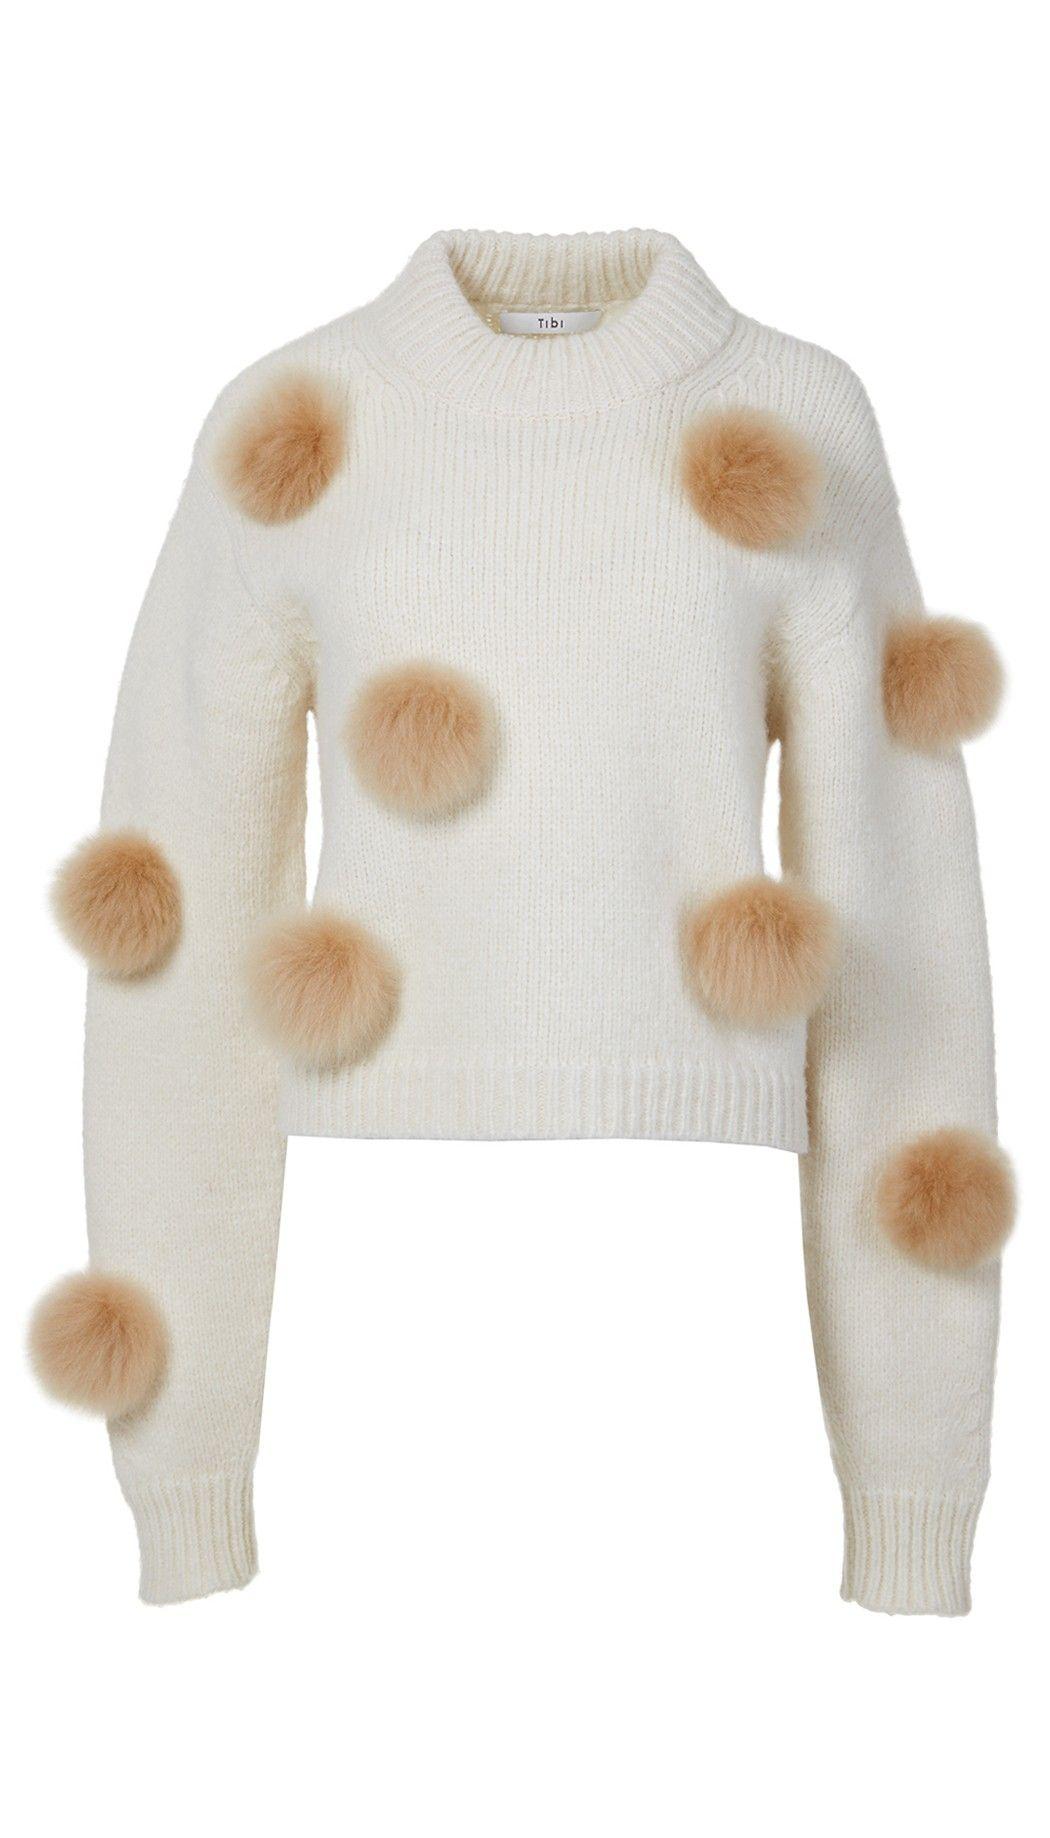 1c6904e4c5c9 Tibi Alpaca Pom Pom Cropped Sweater